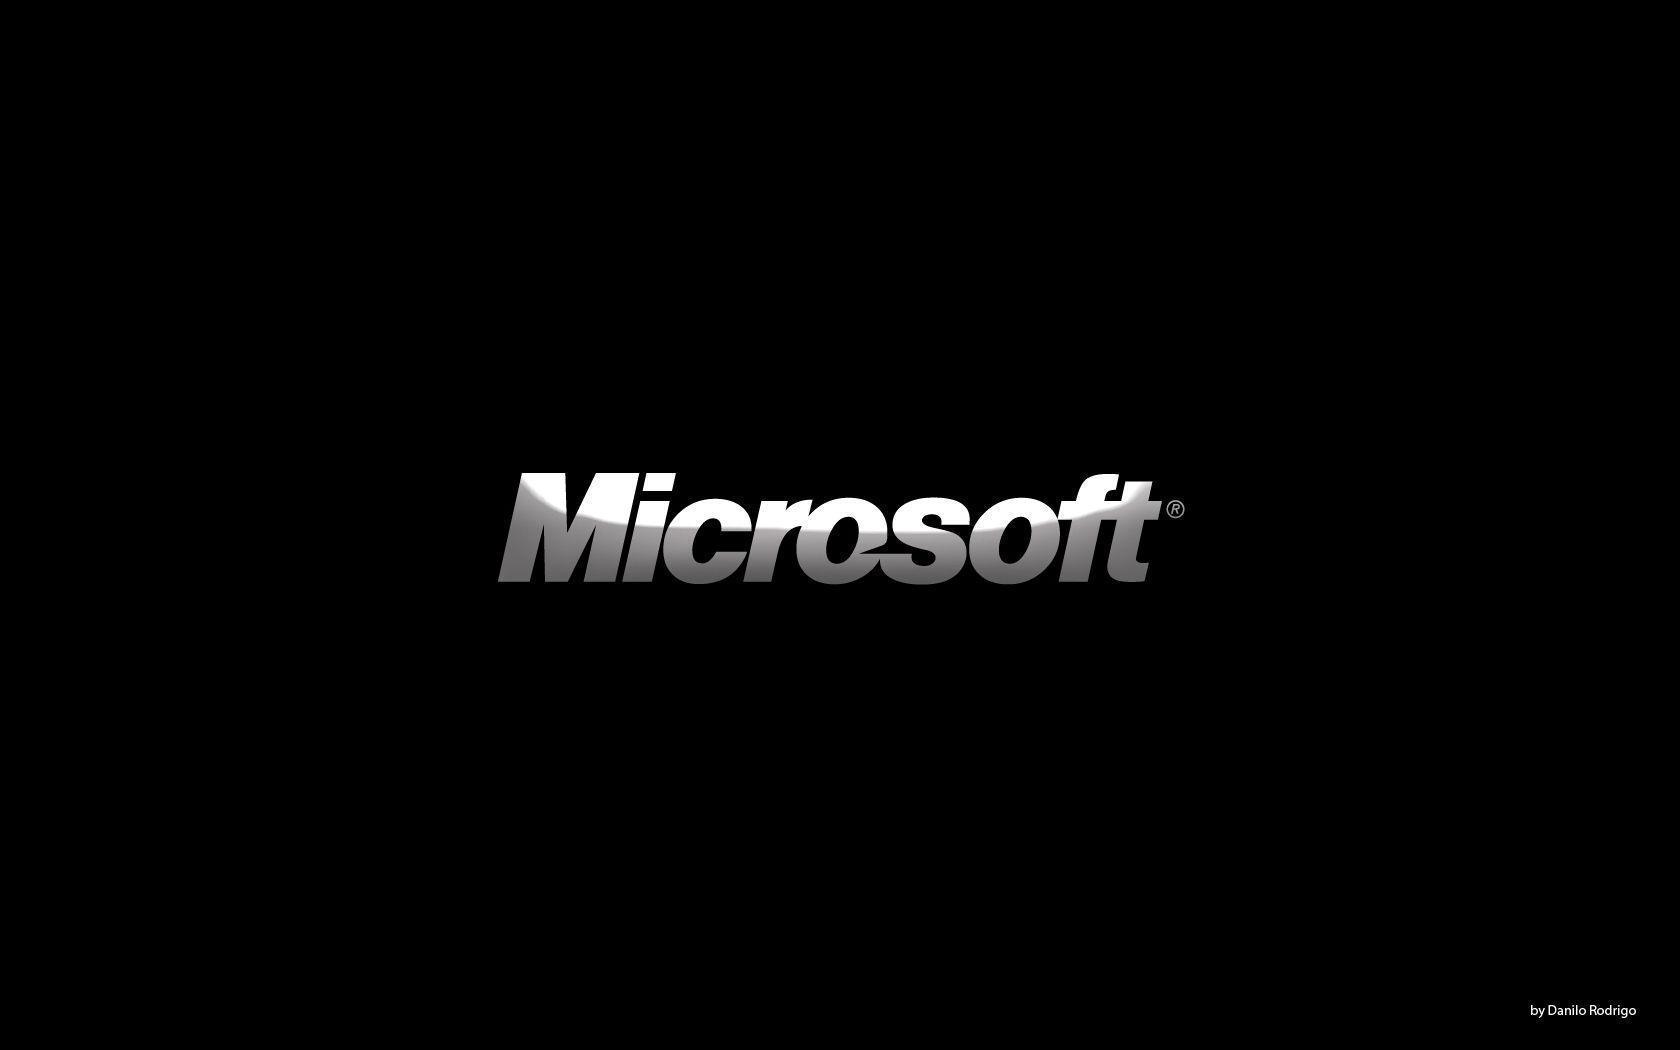 Free Microsoft Desktop Backgrounds Wallpaper Cave